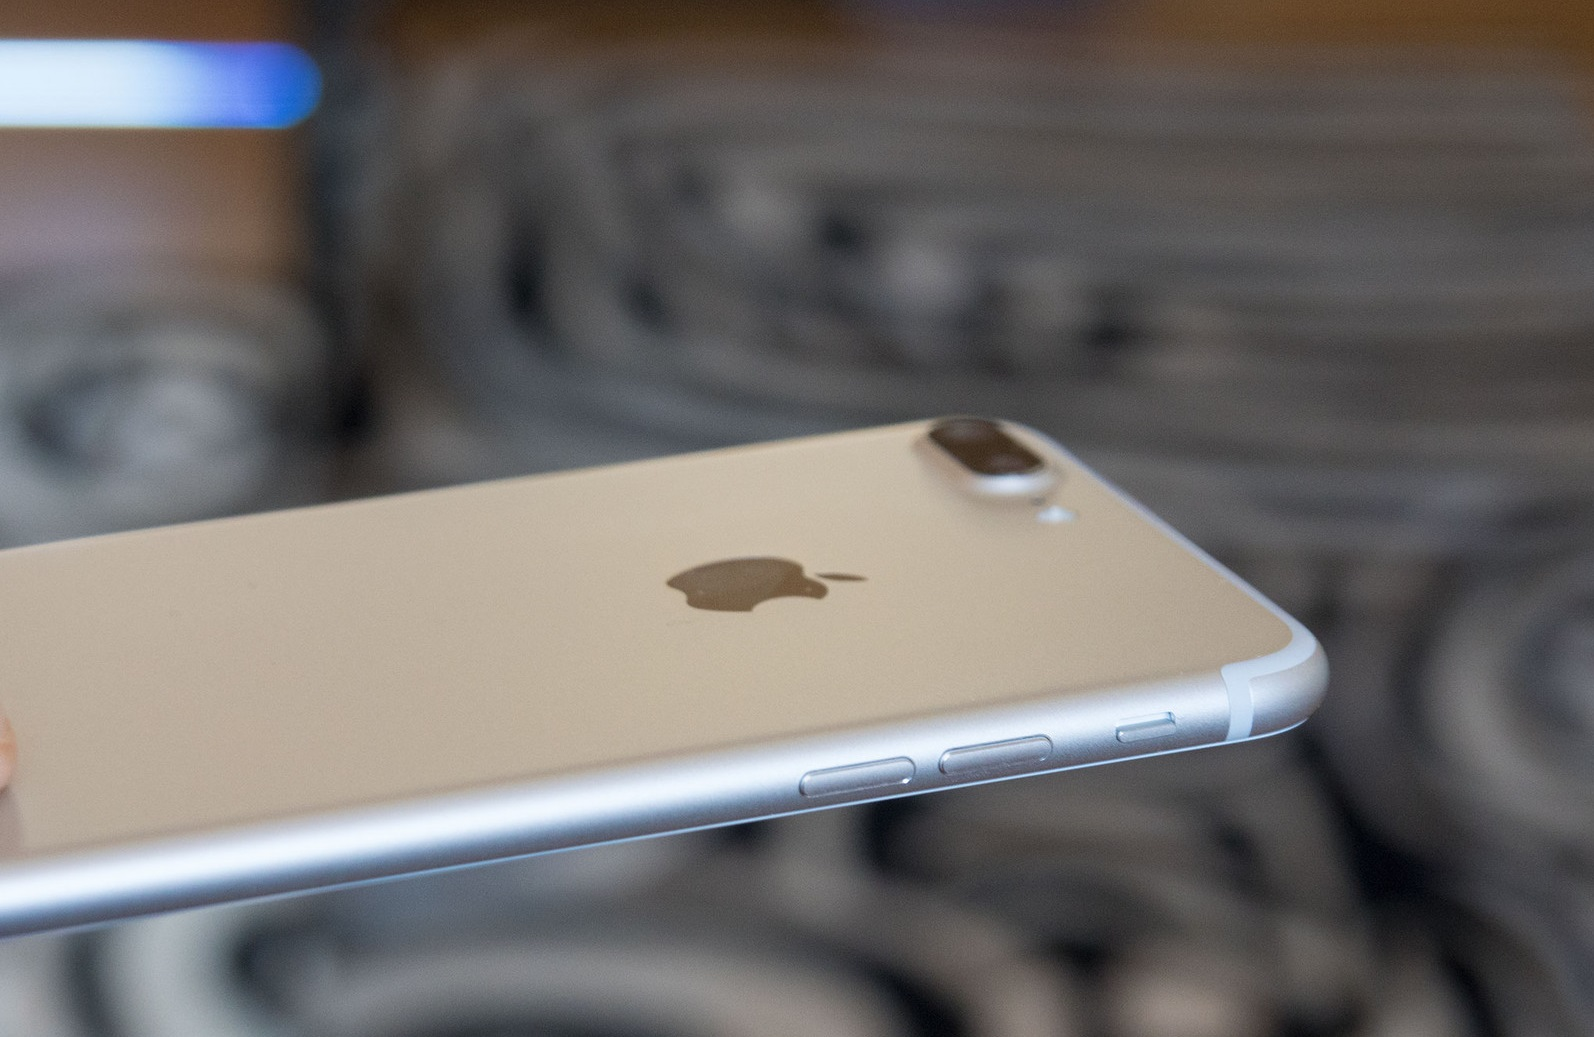 obzor-iphone-7-plus-glazami-polzovatelya-android-dizajjn-2